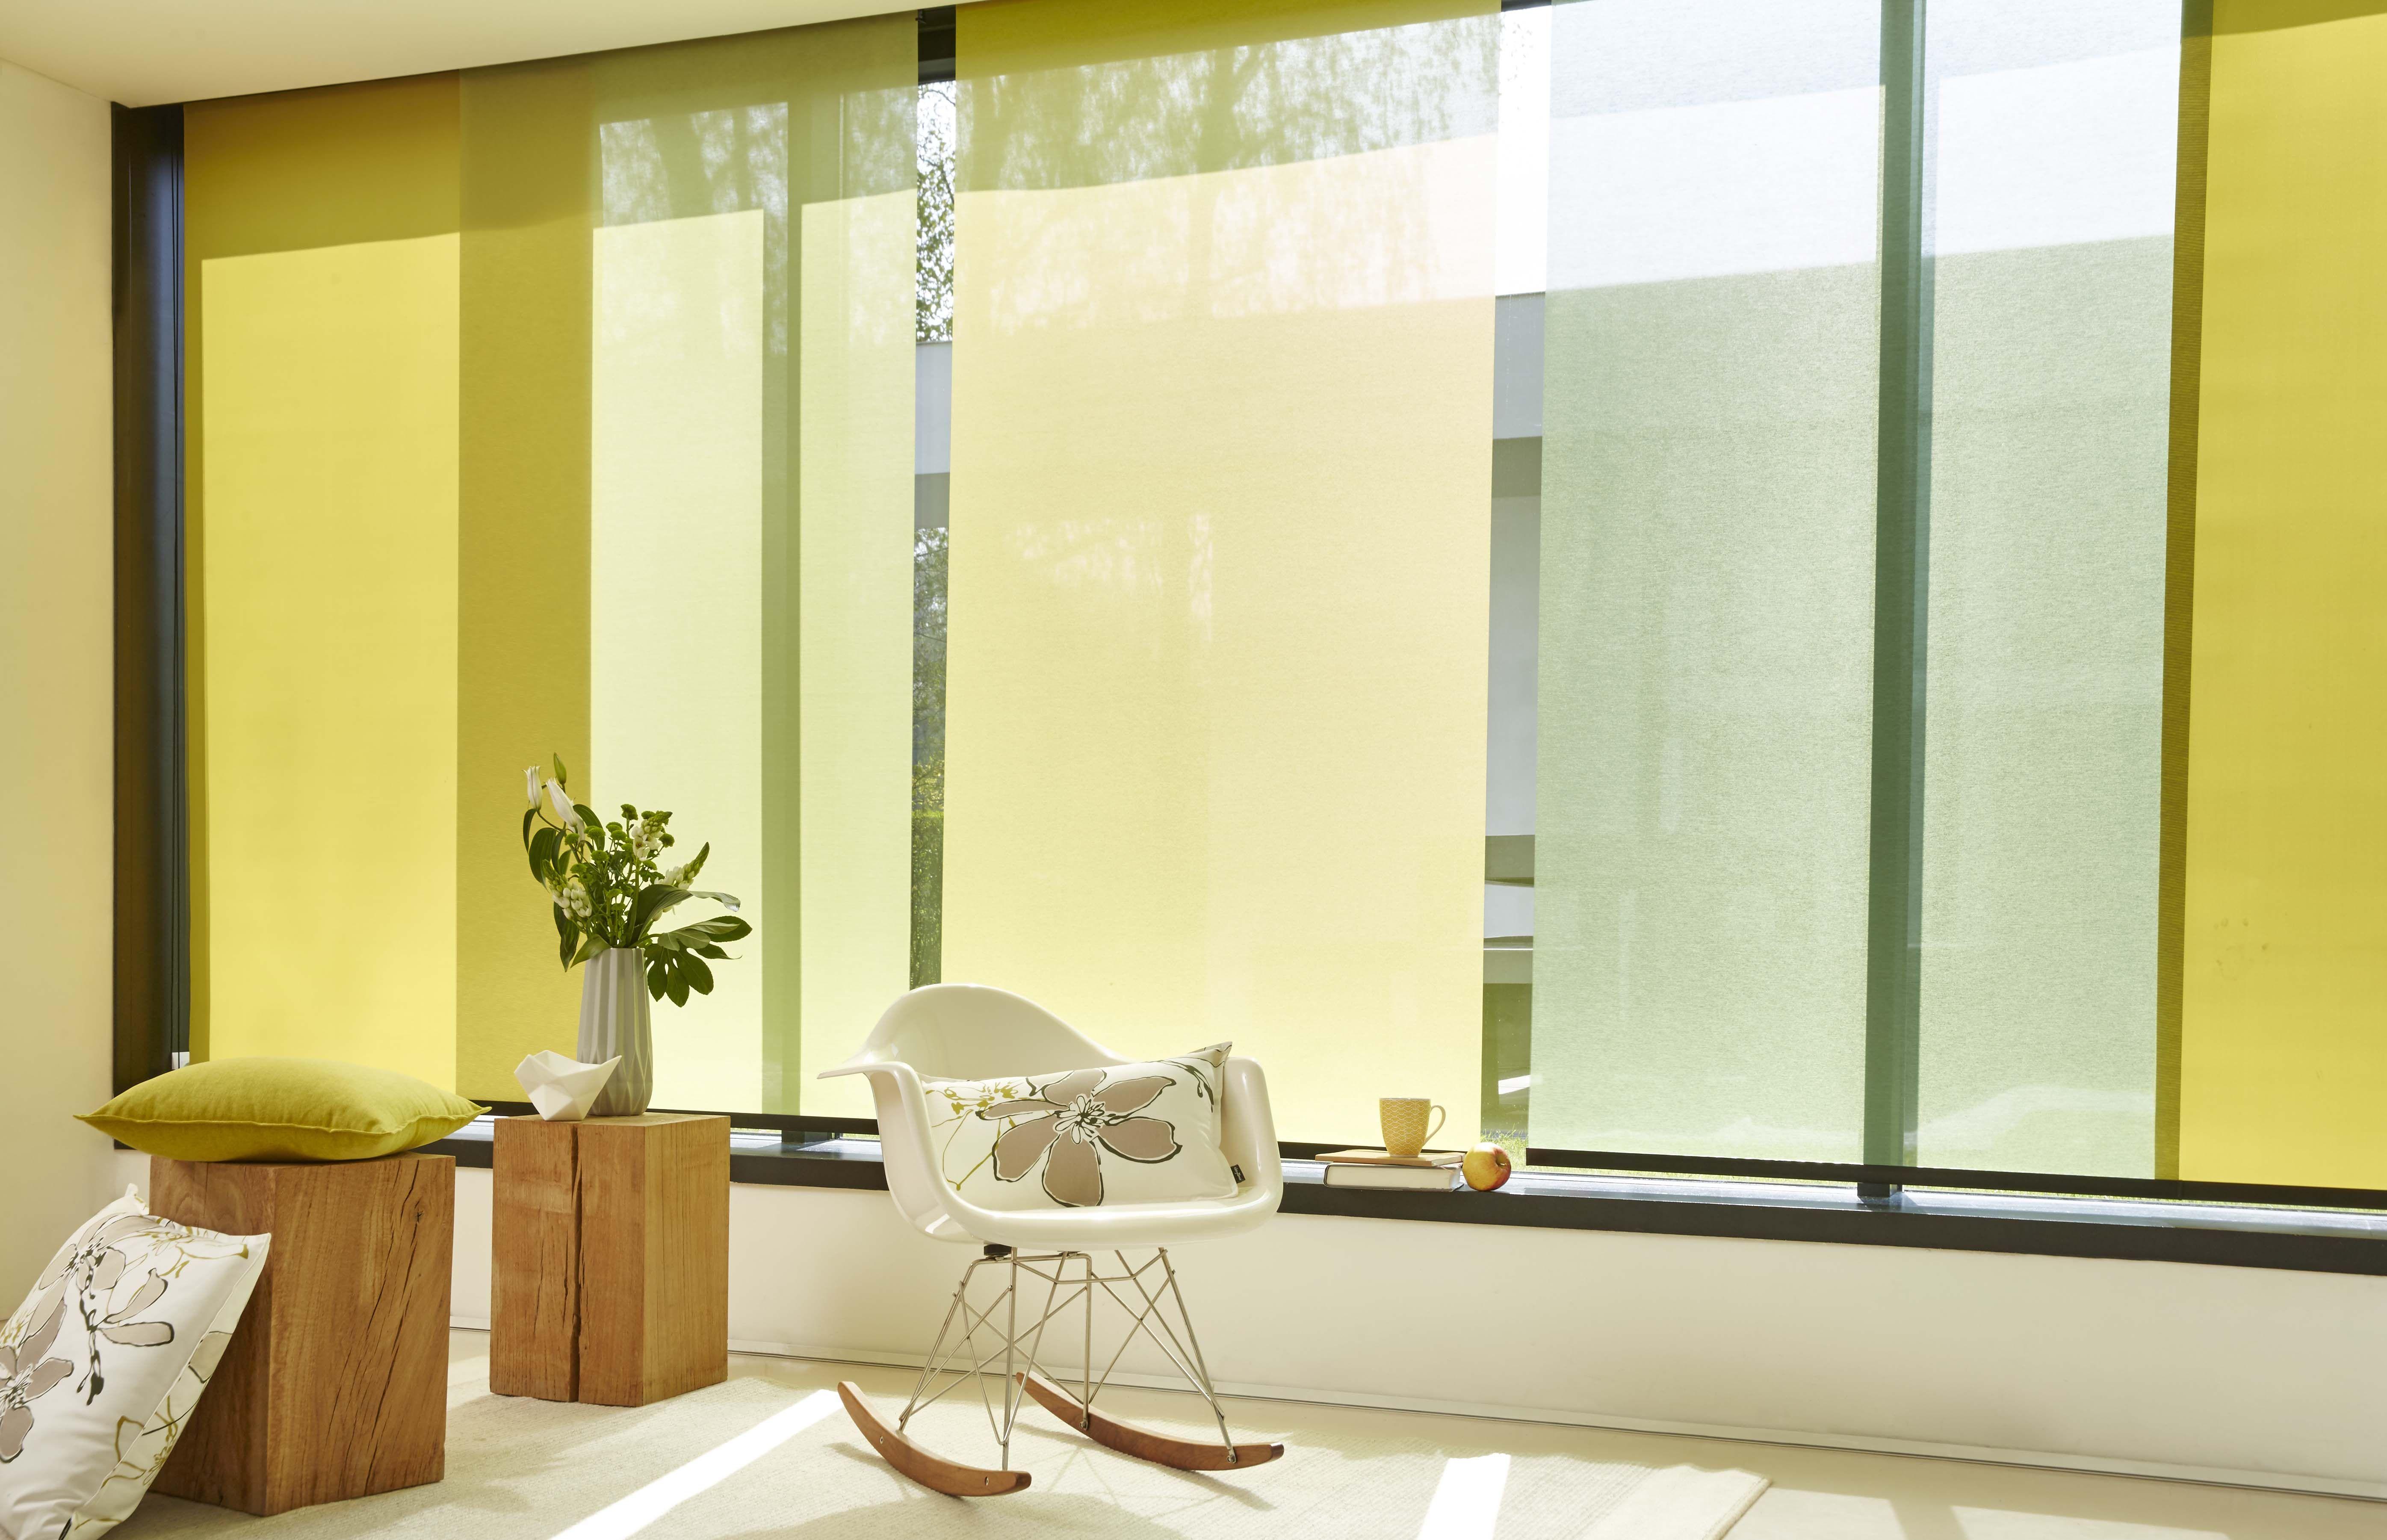 heytens home decor window design home